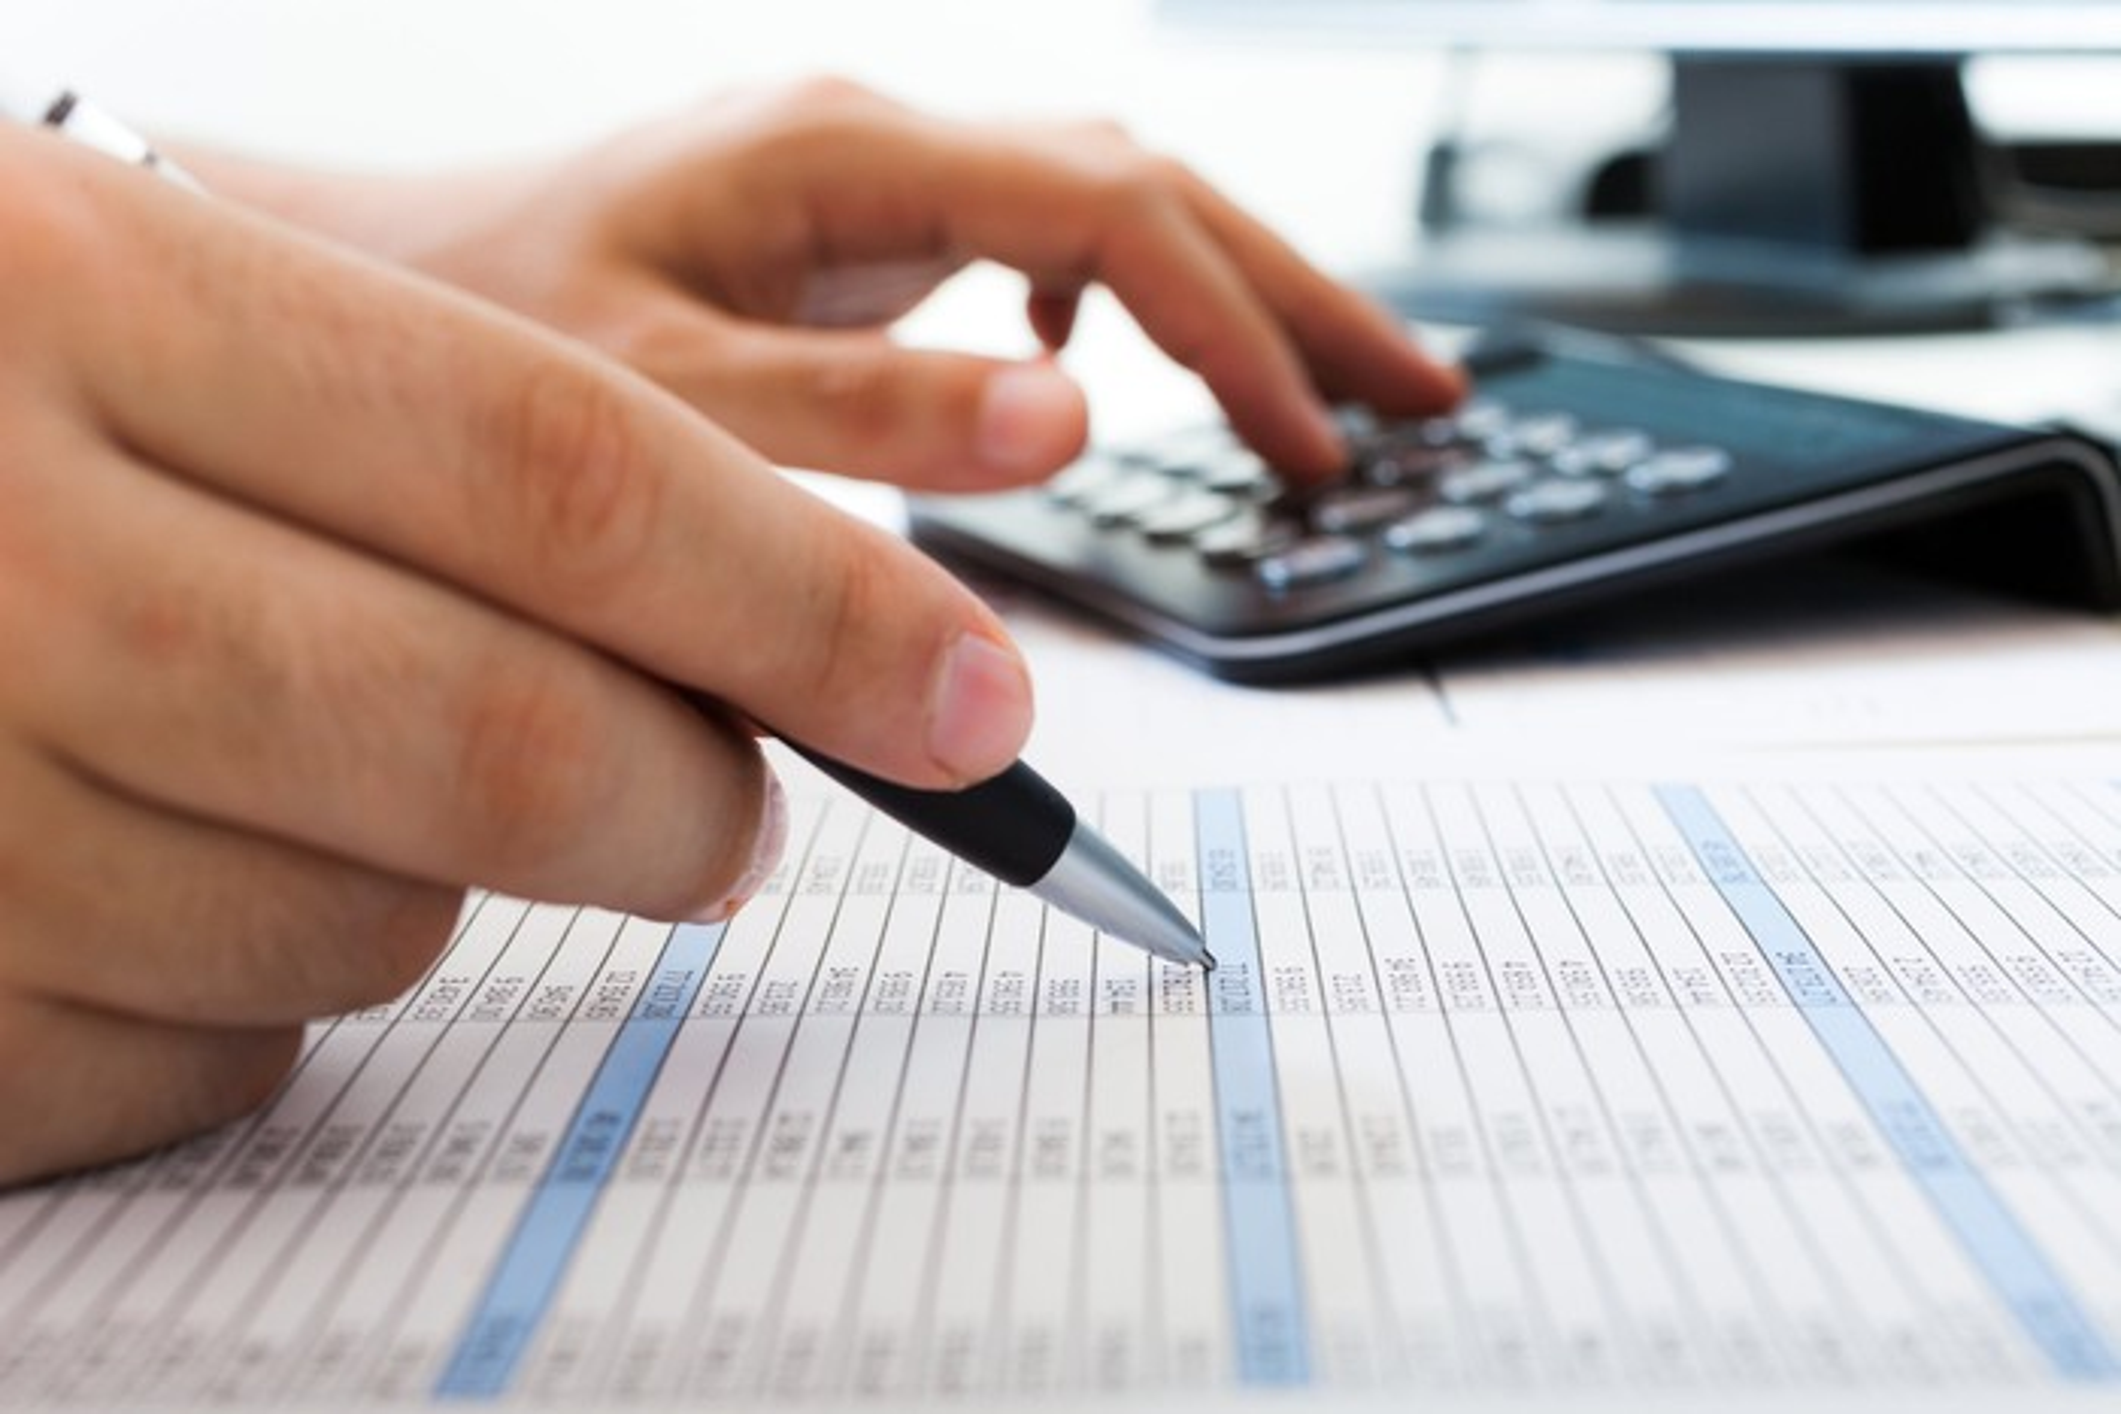 An accountant using a pen and calculator to examine a balance sheet.